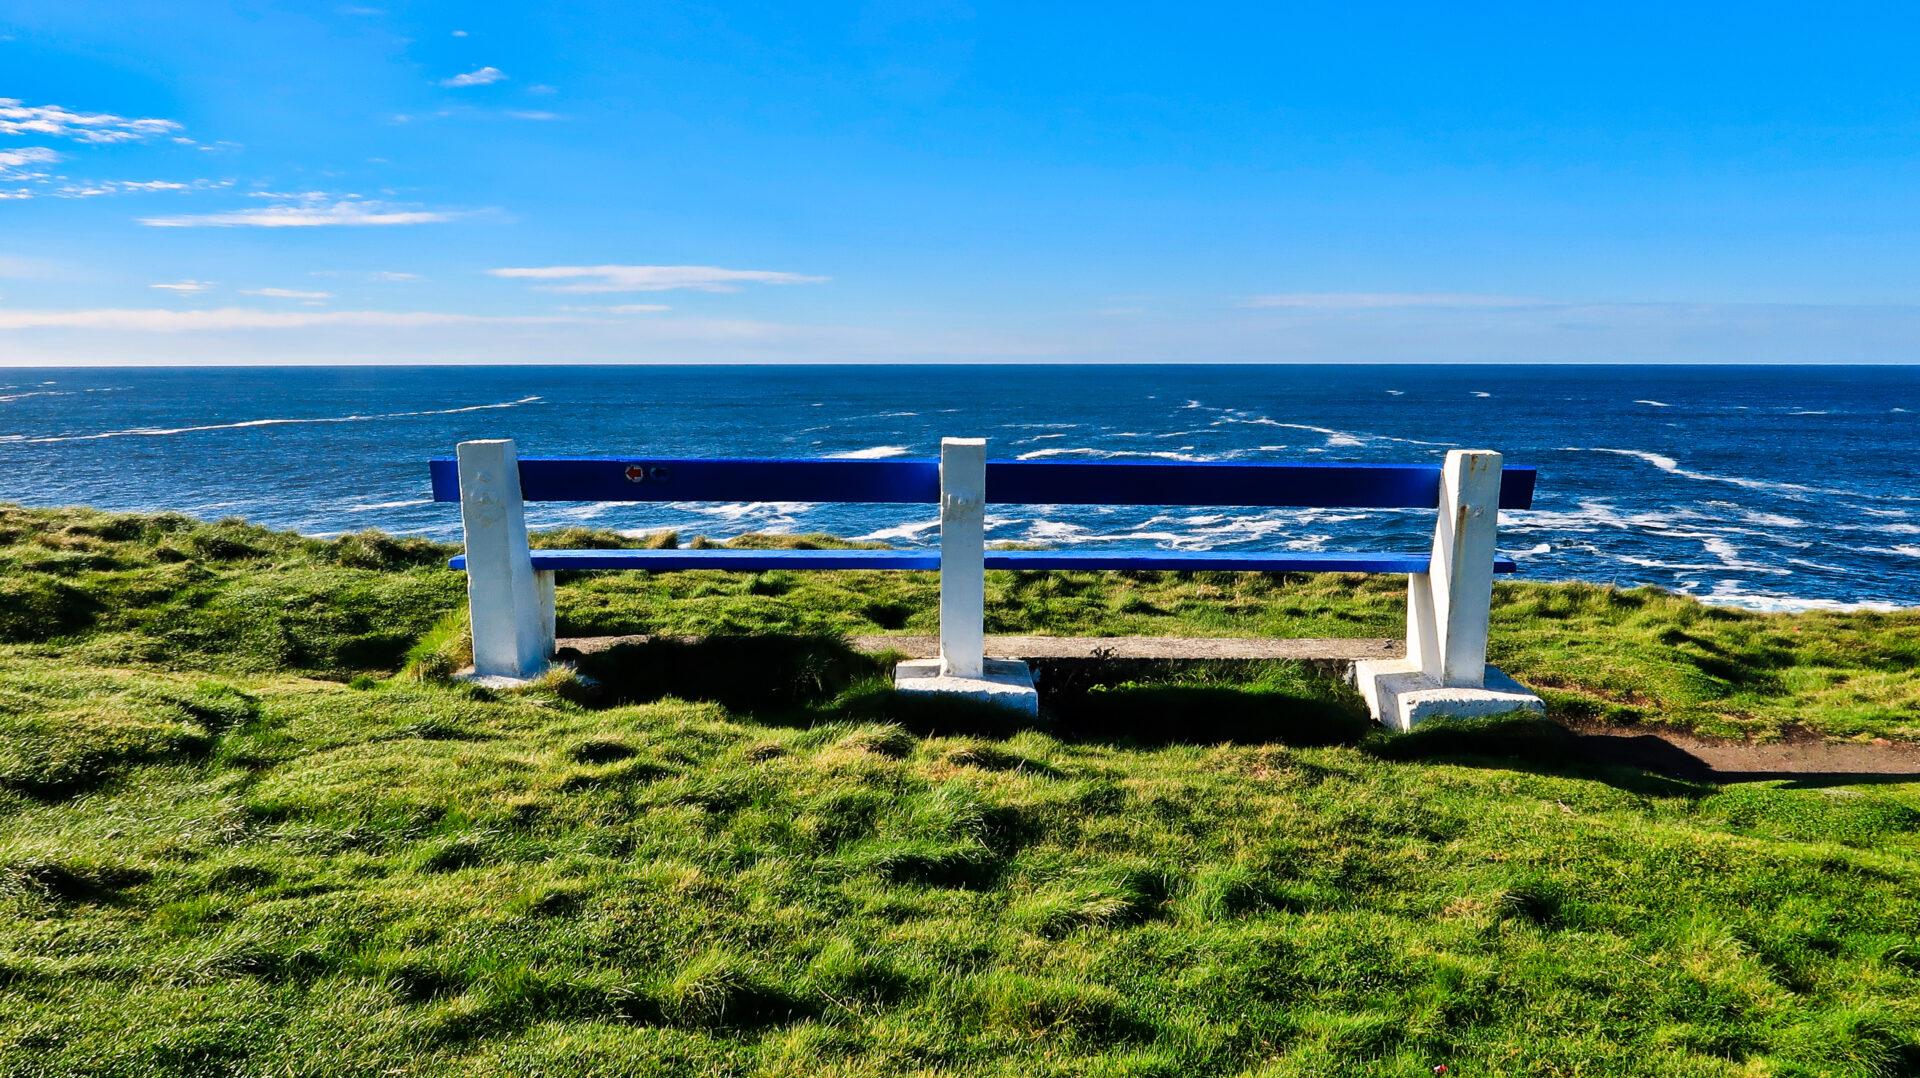 Sitting in front of Kilkee Cliffs - Irlanda 2018